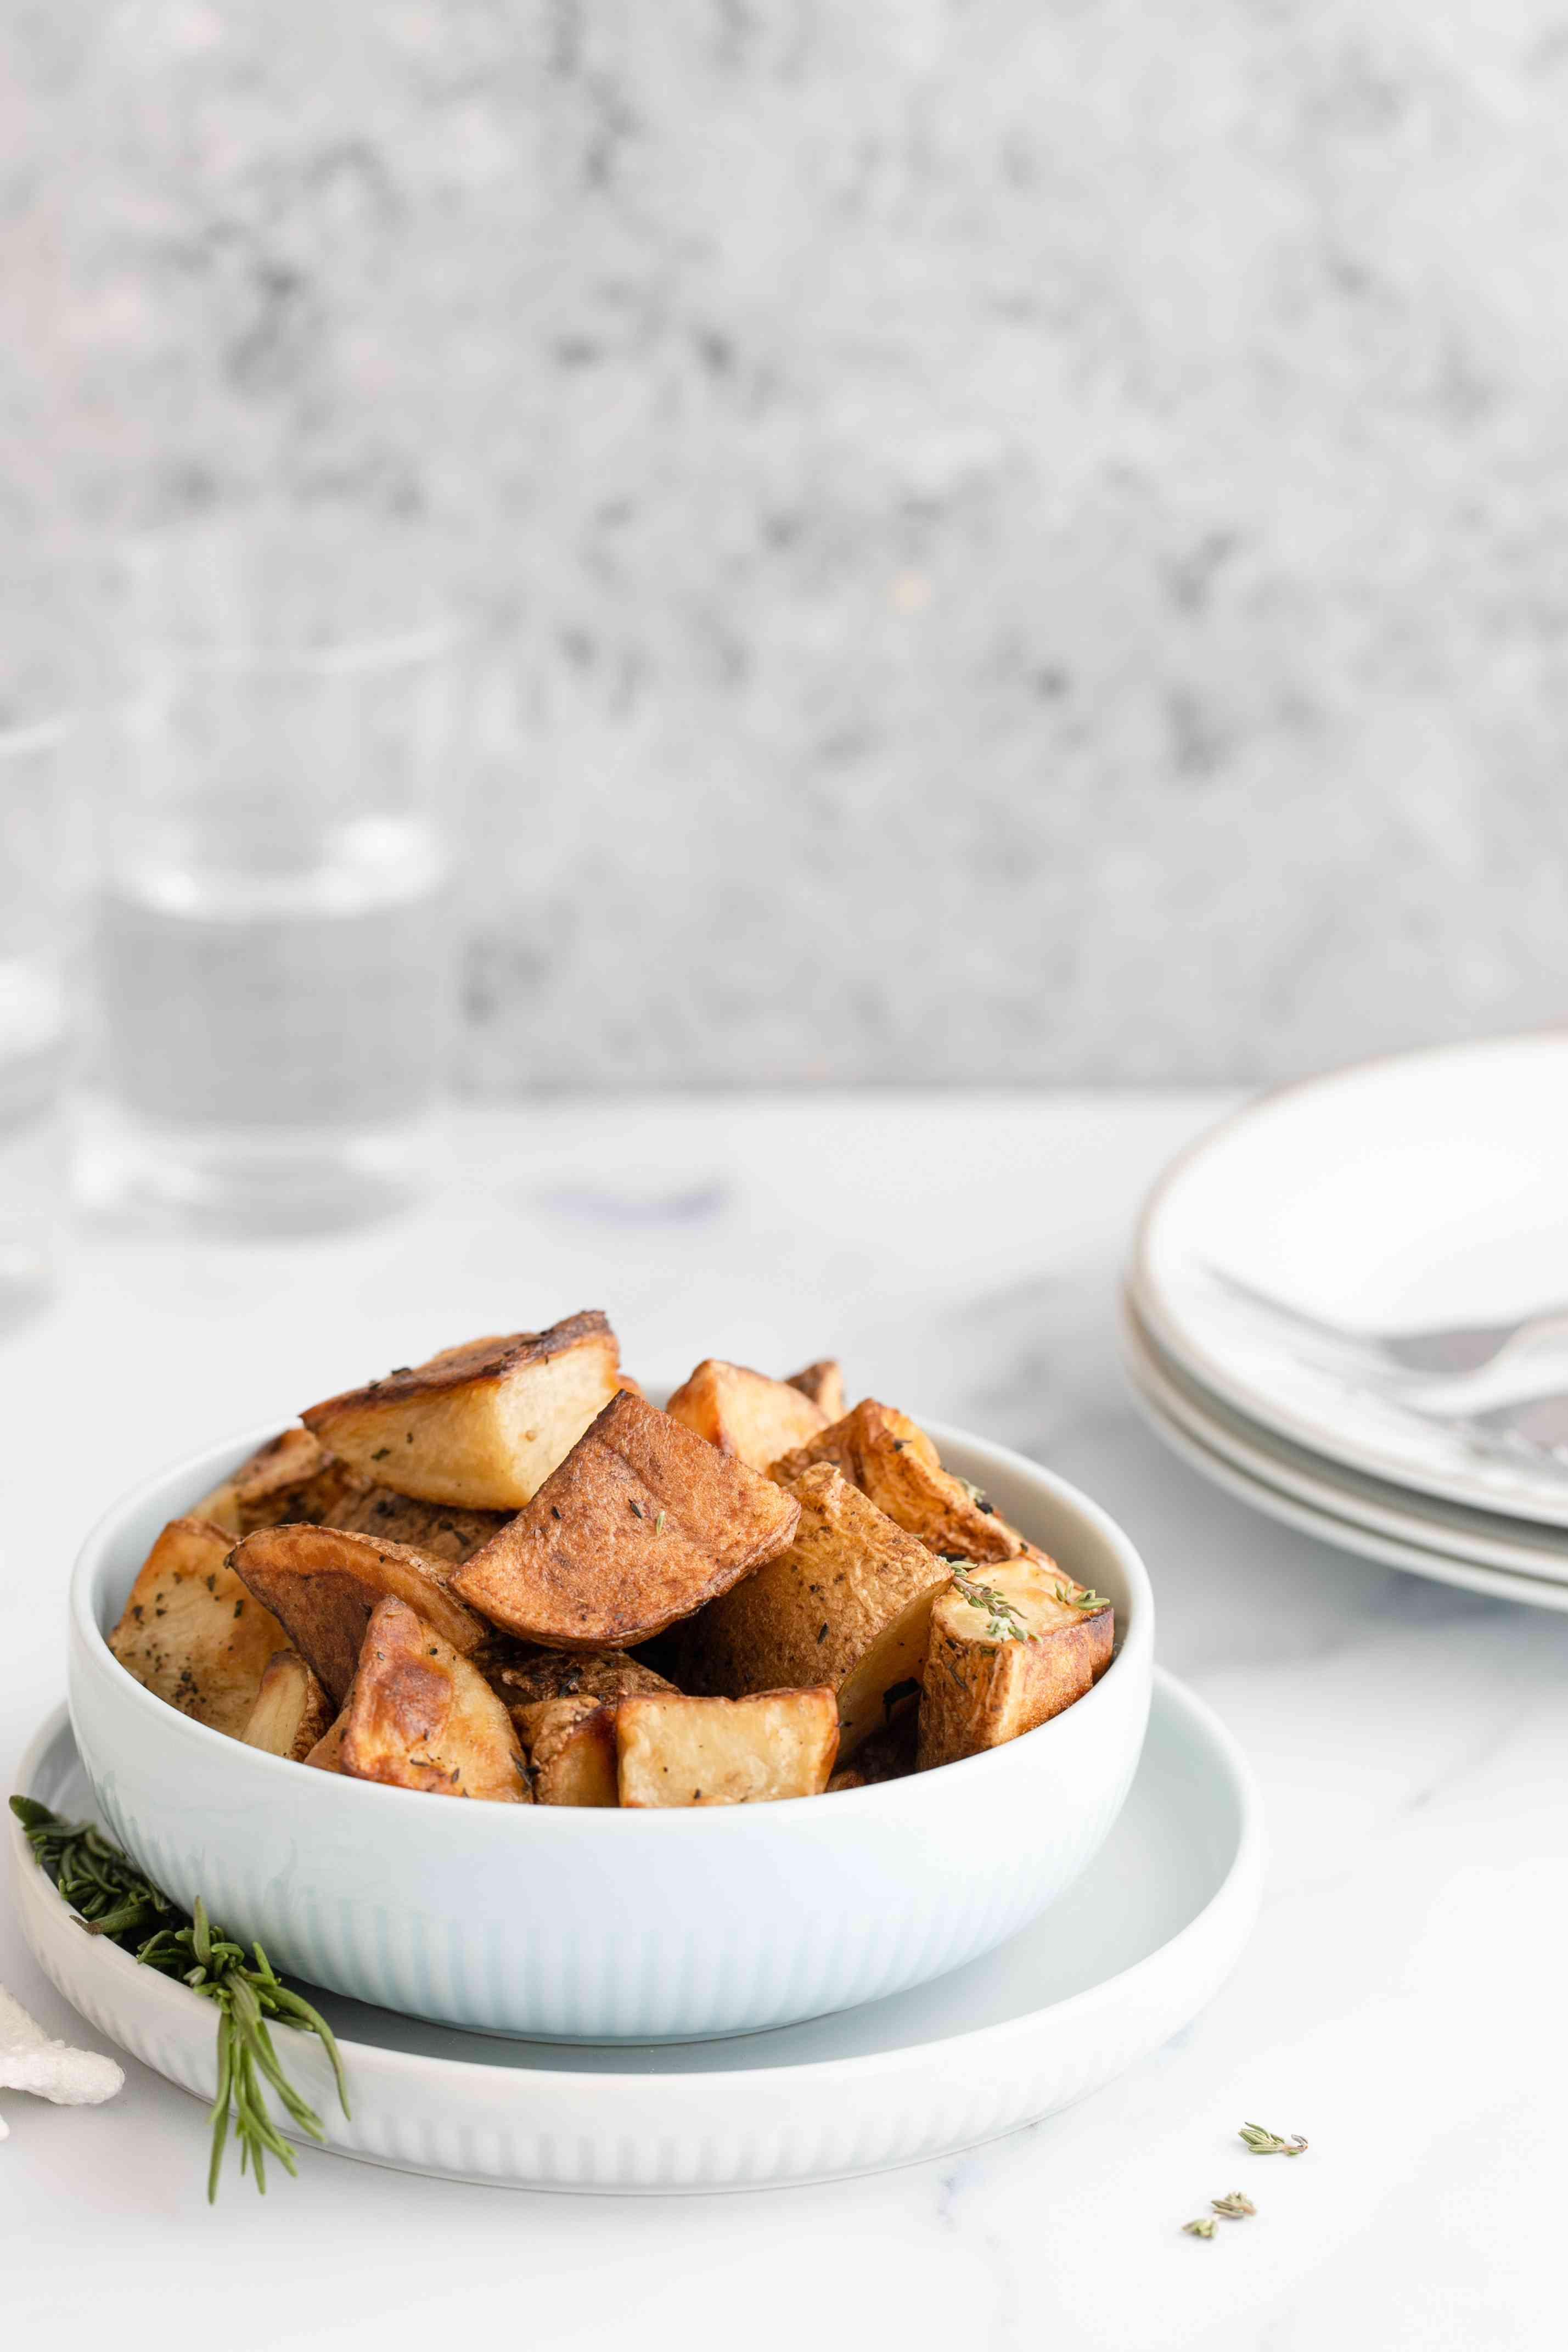 Roasted rosemary thyme potatoes